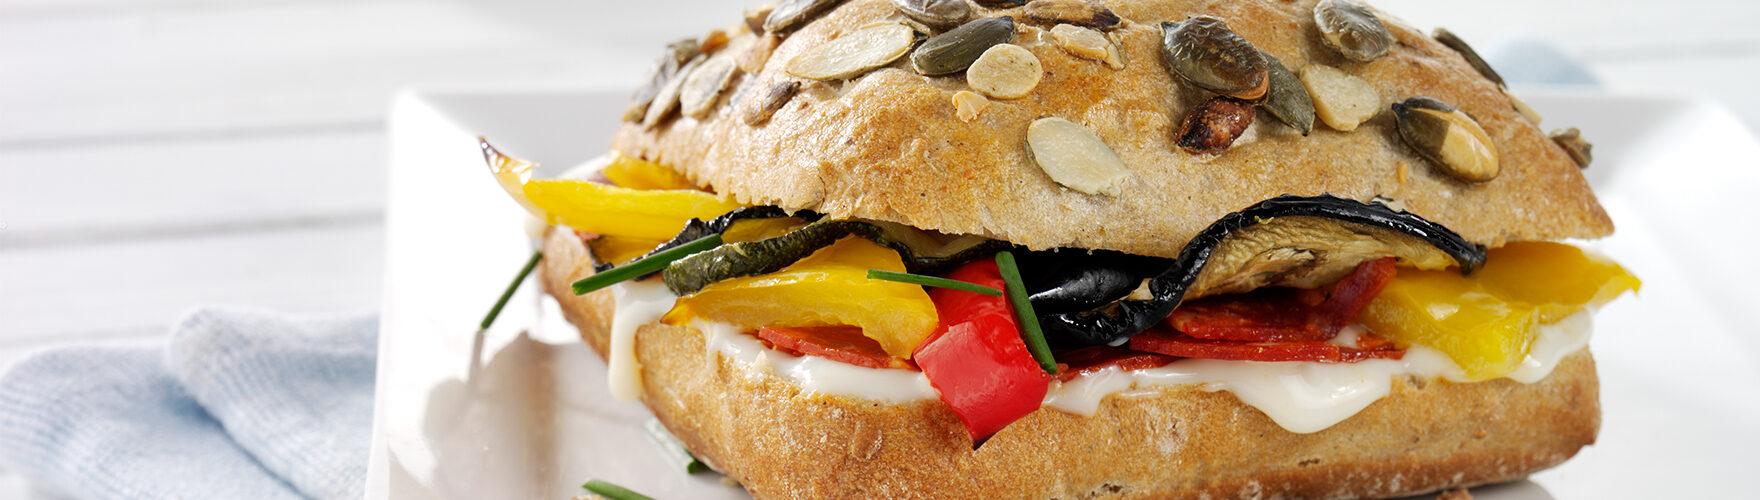 Pompoenbroodje met chorizo en gegrilde groenten